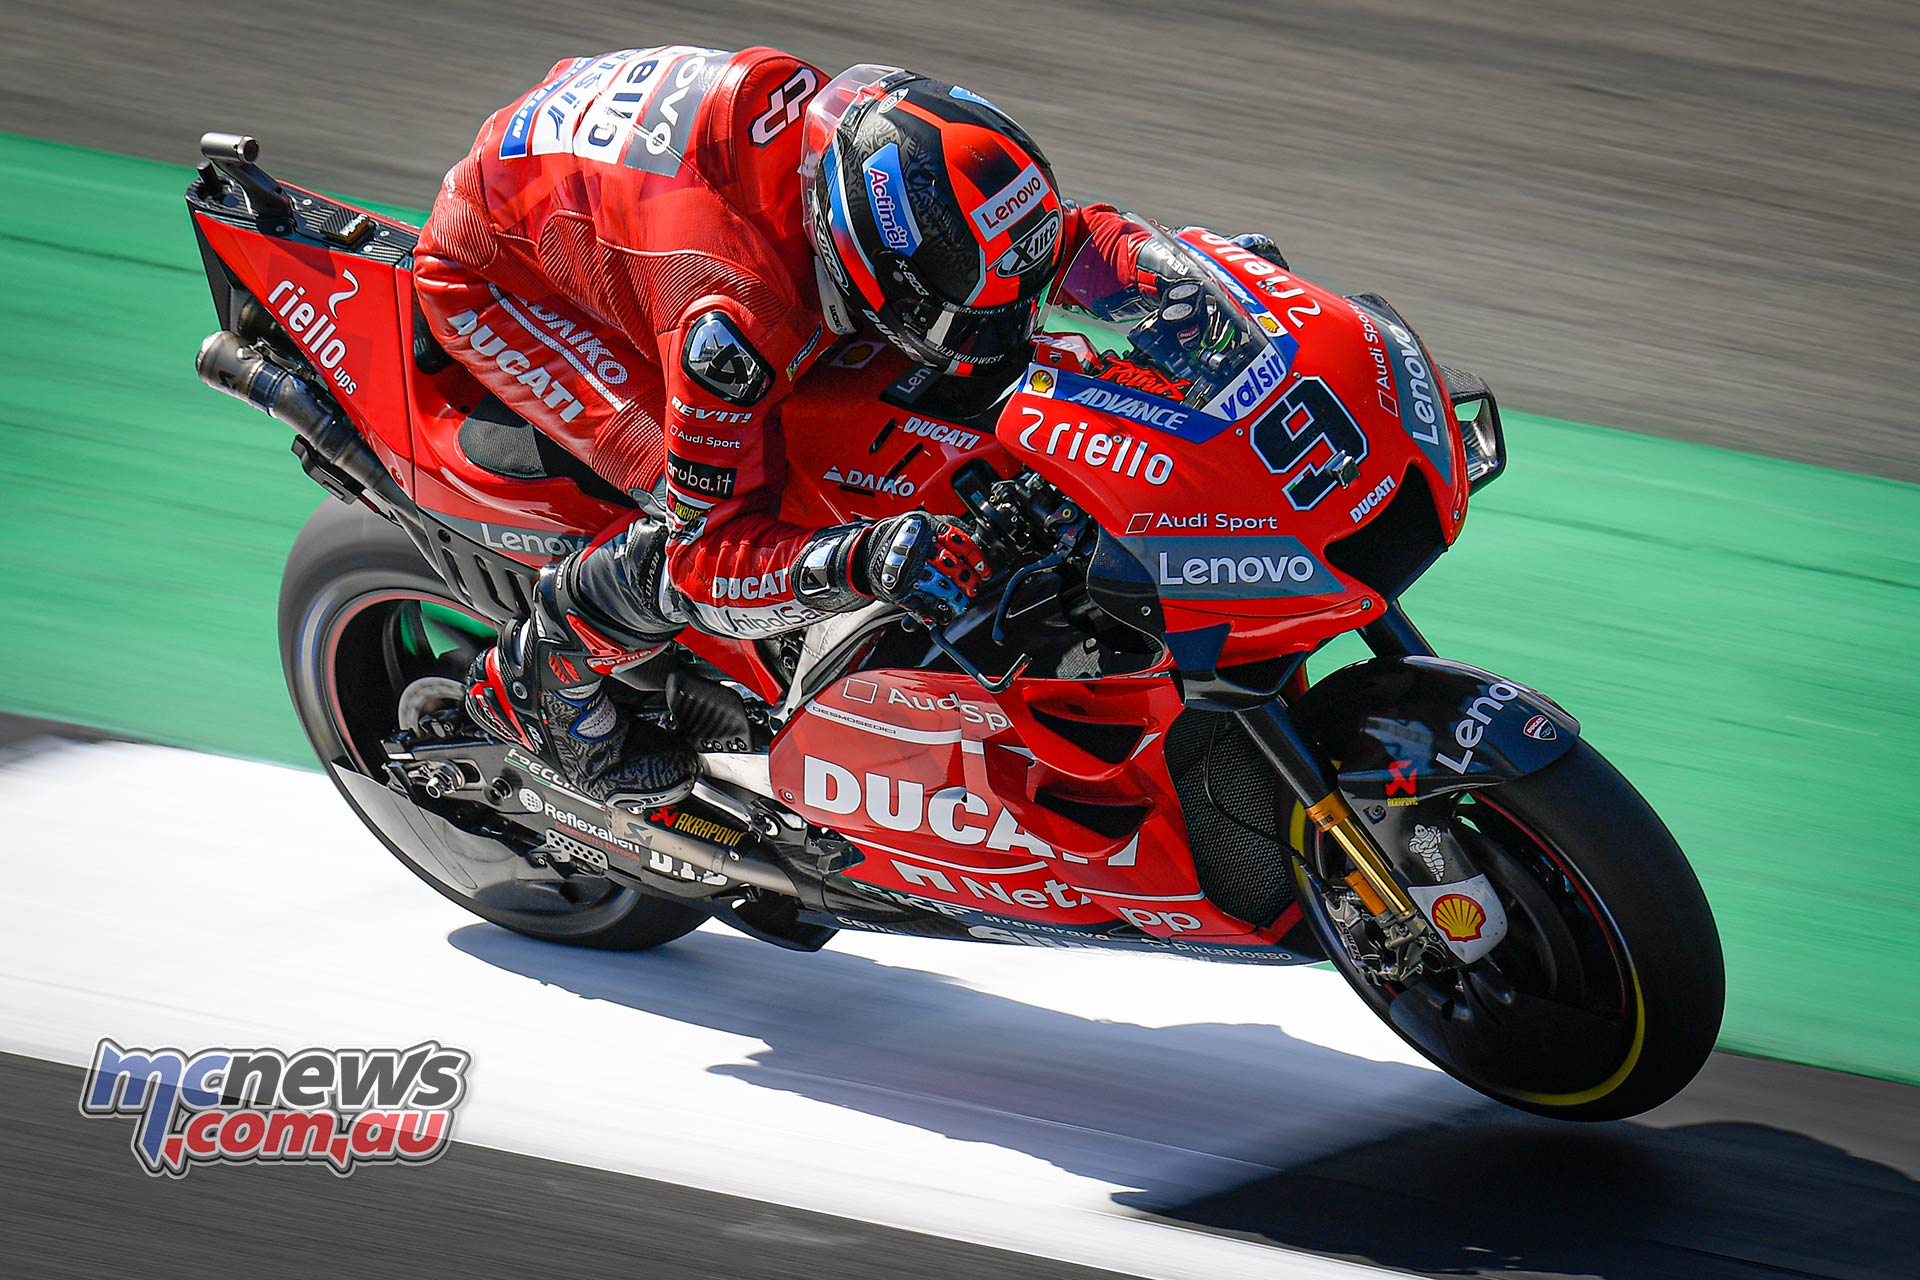 MotoGP Rnd Silverstone Fri Petrucci